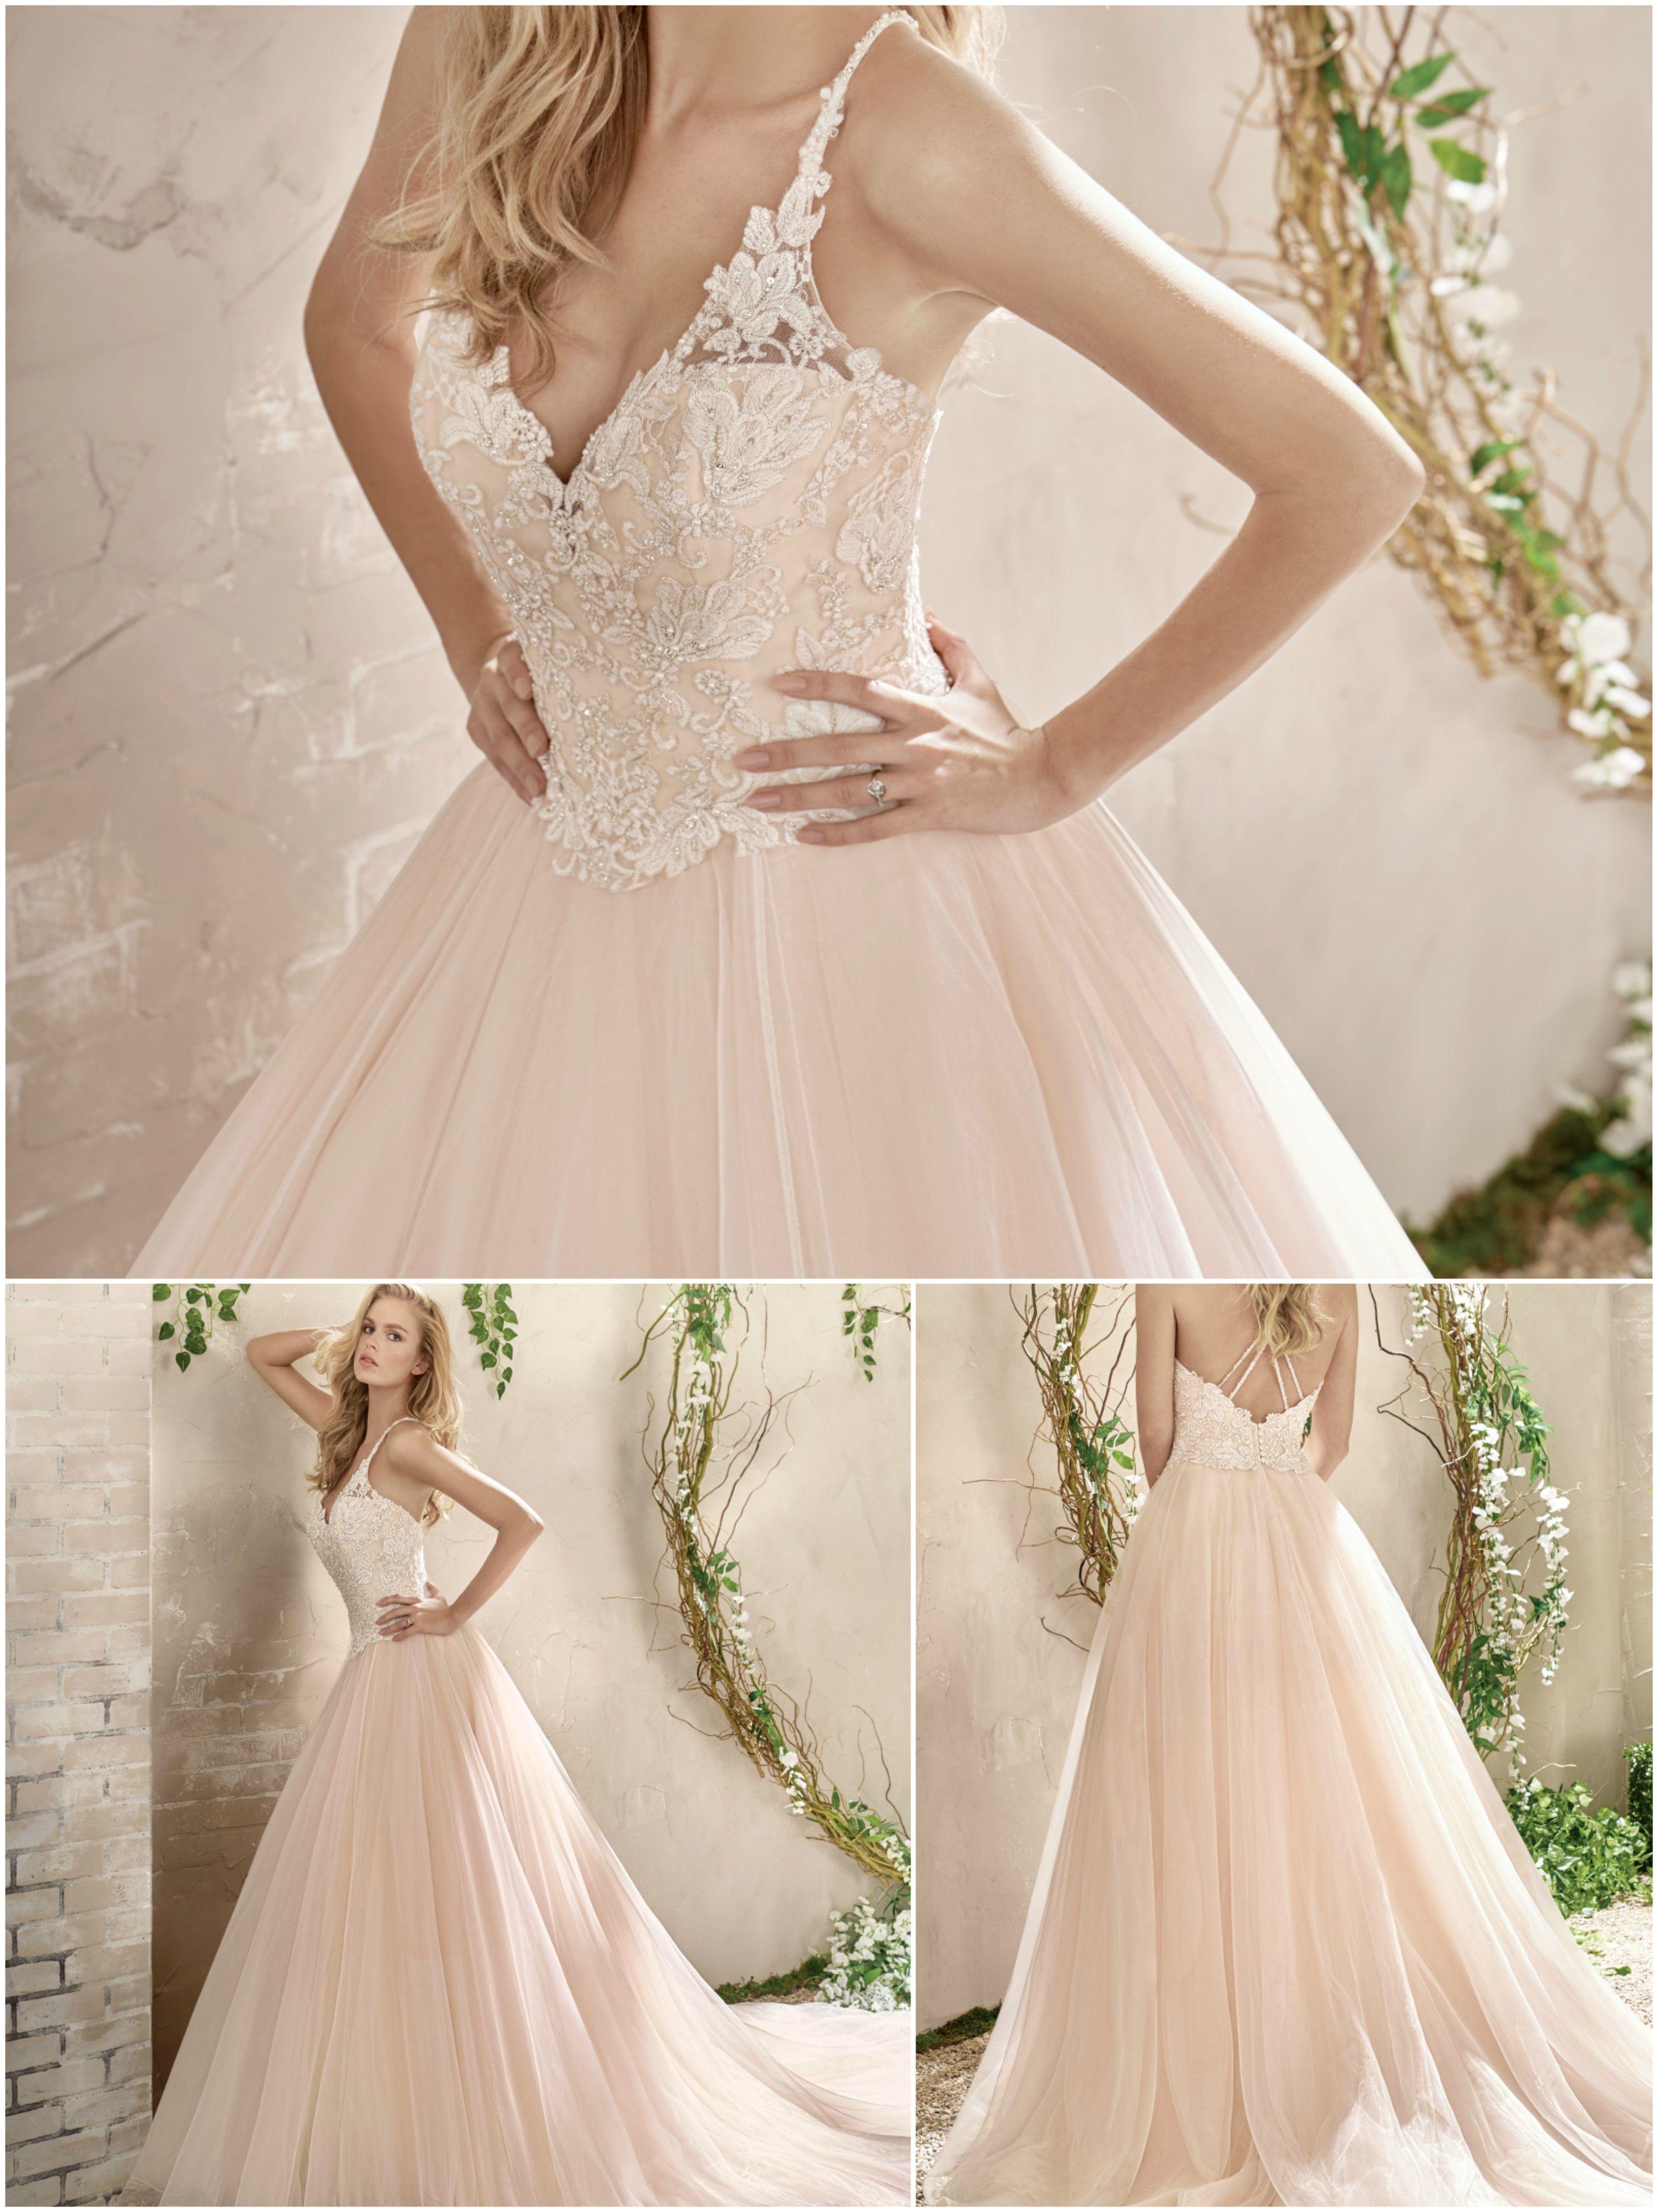 Jasmine Bridal Jasmine Bridal Bridal Bridal Collection